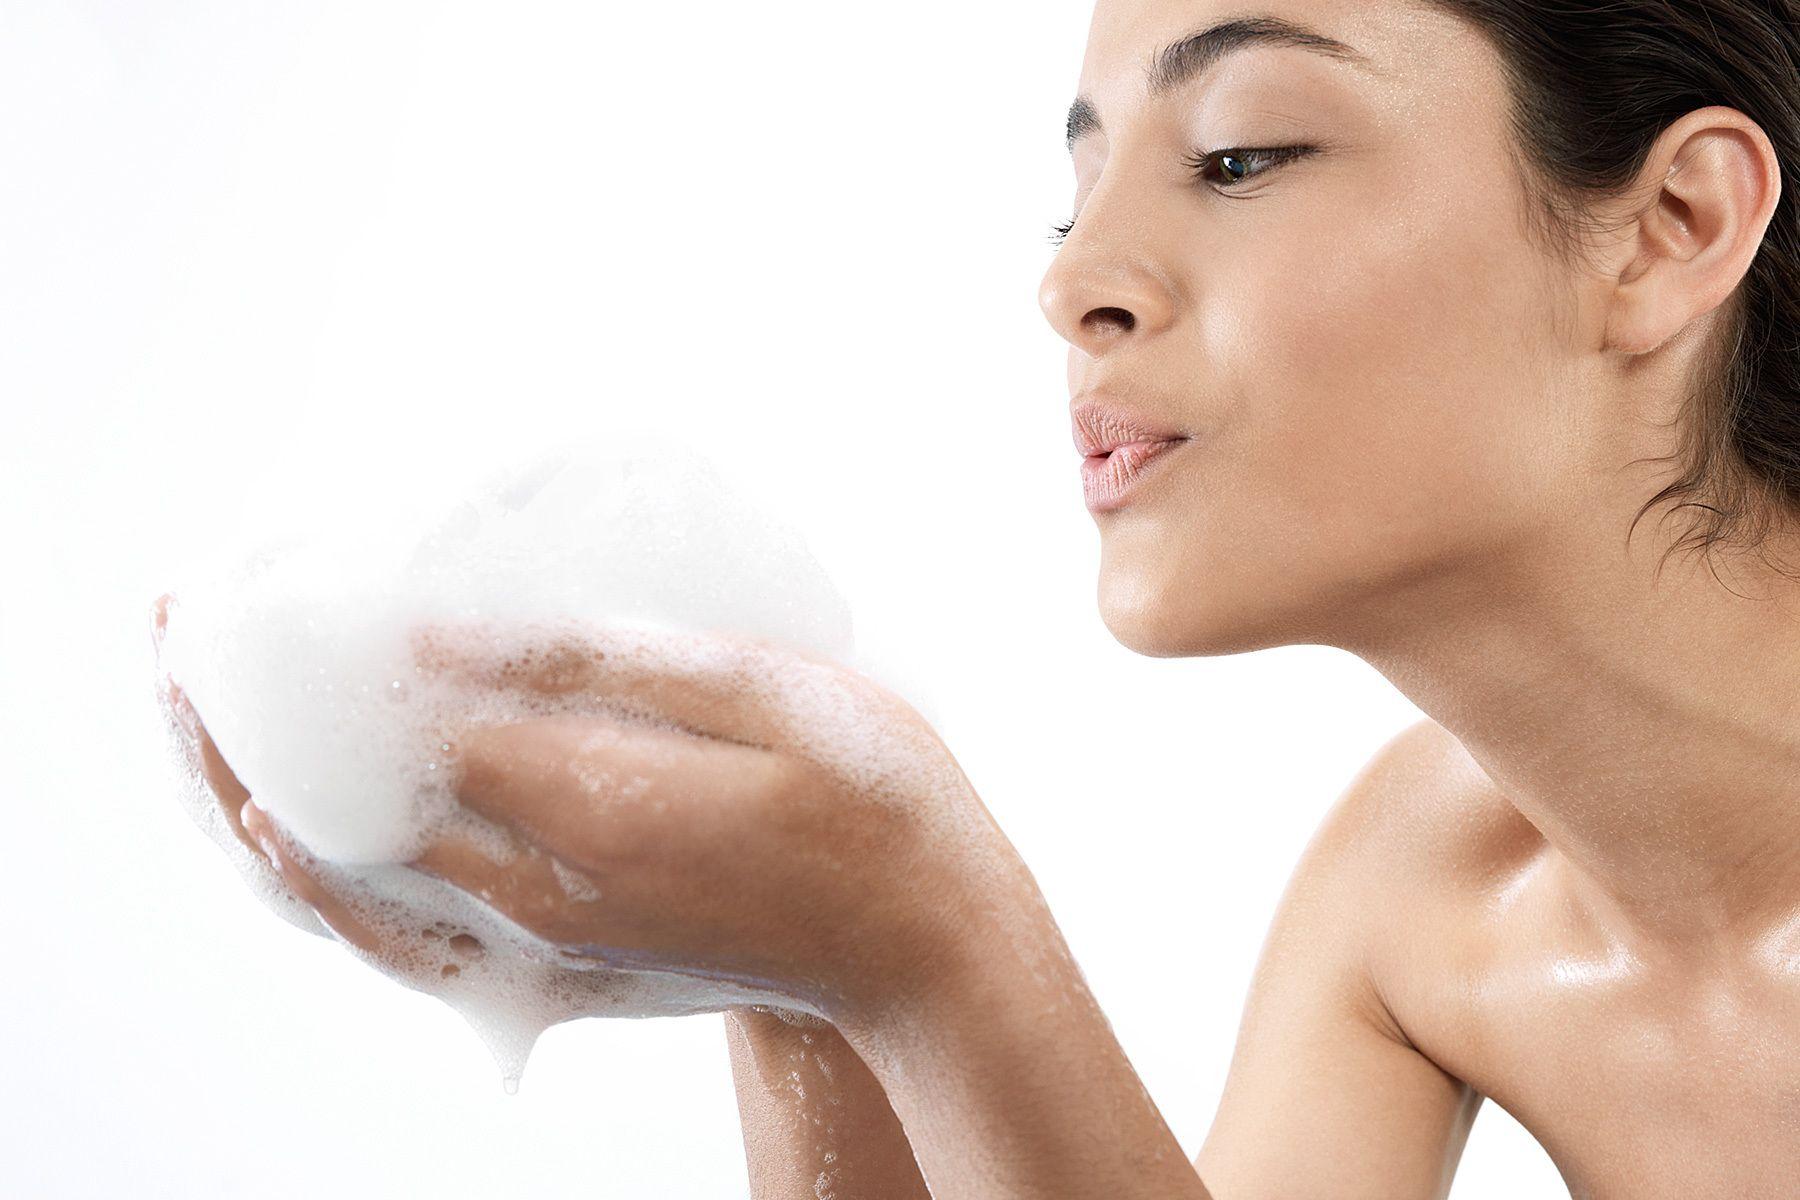 1beauty_avon_soap_clean_a.jpg